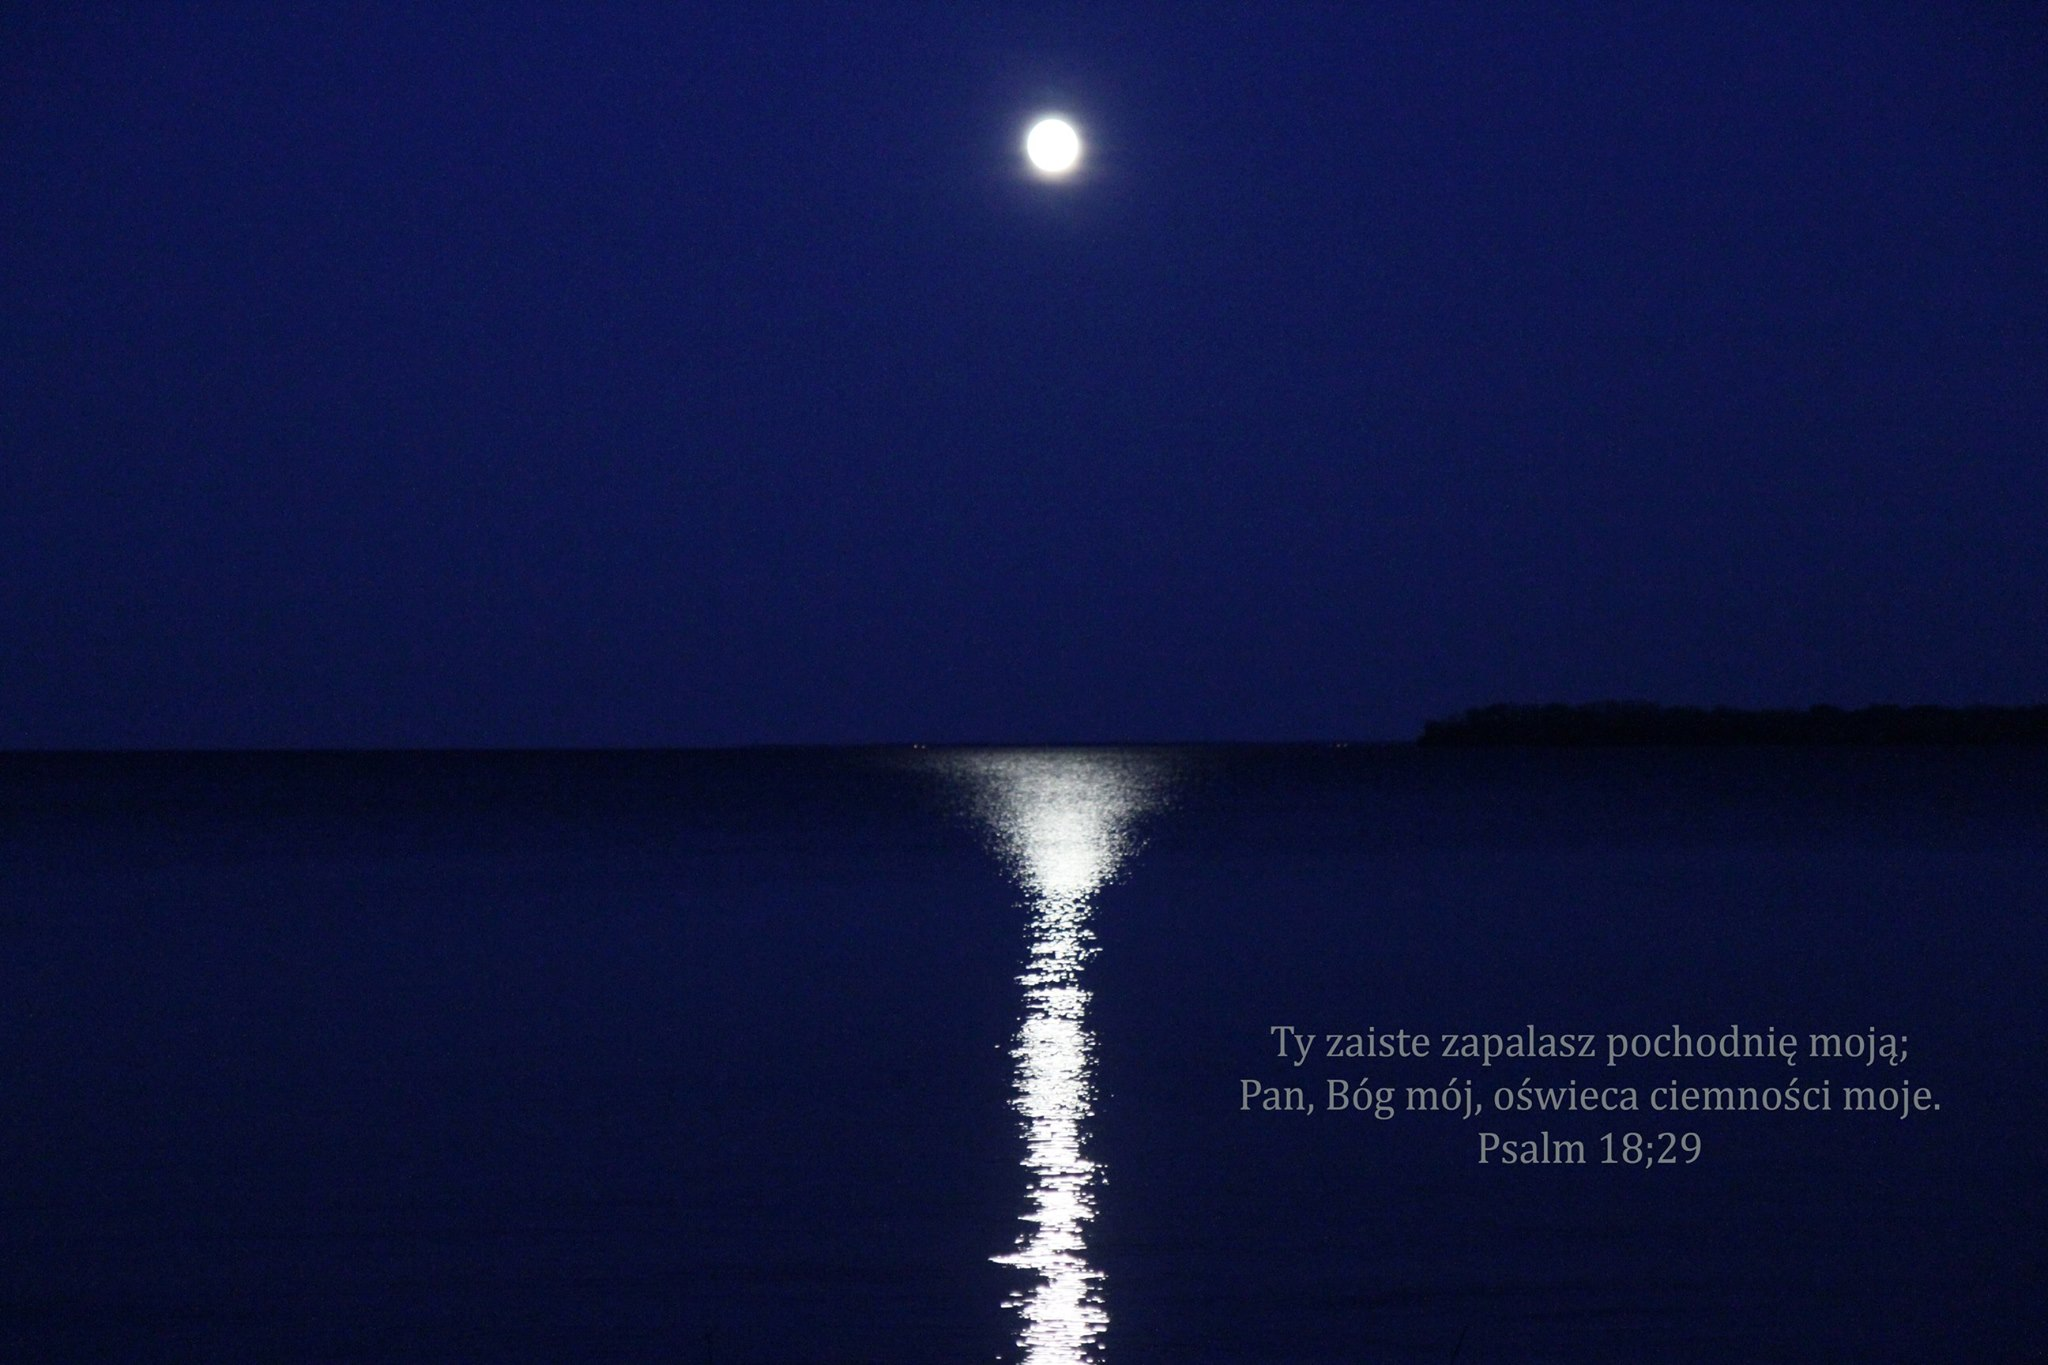 Psalm 18:21